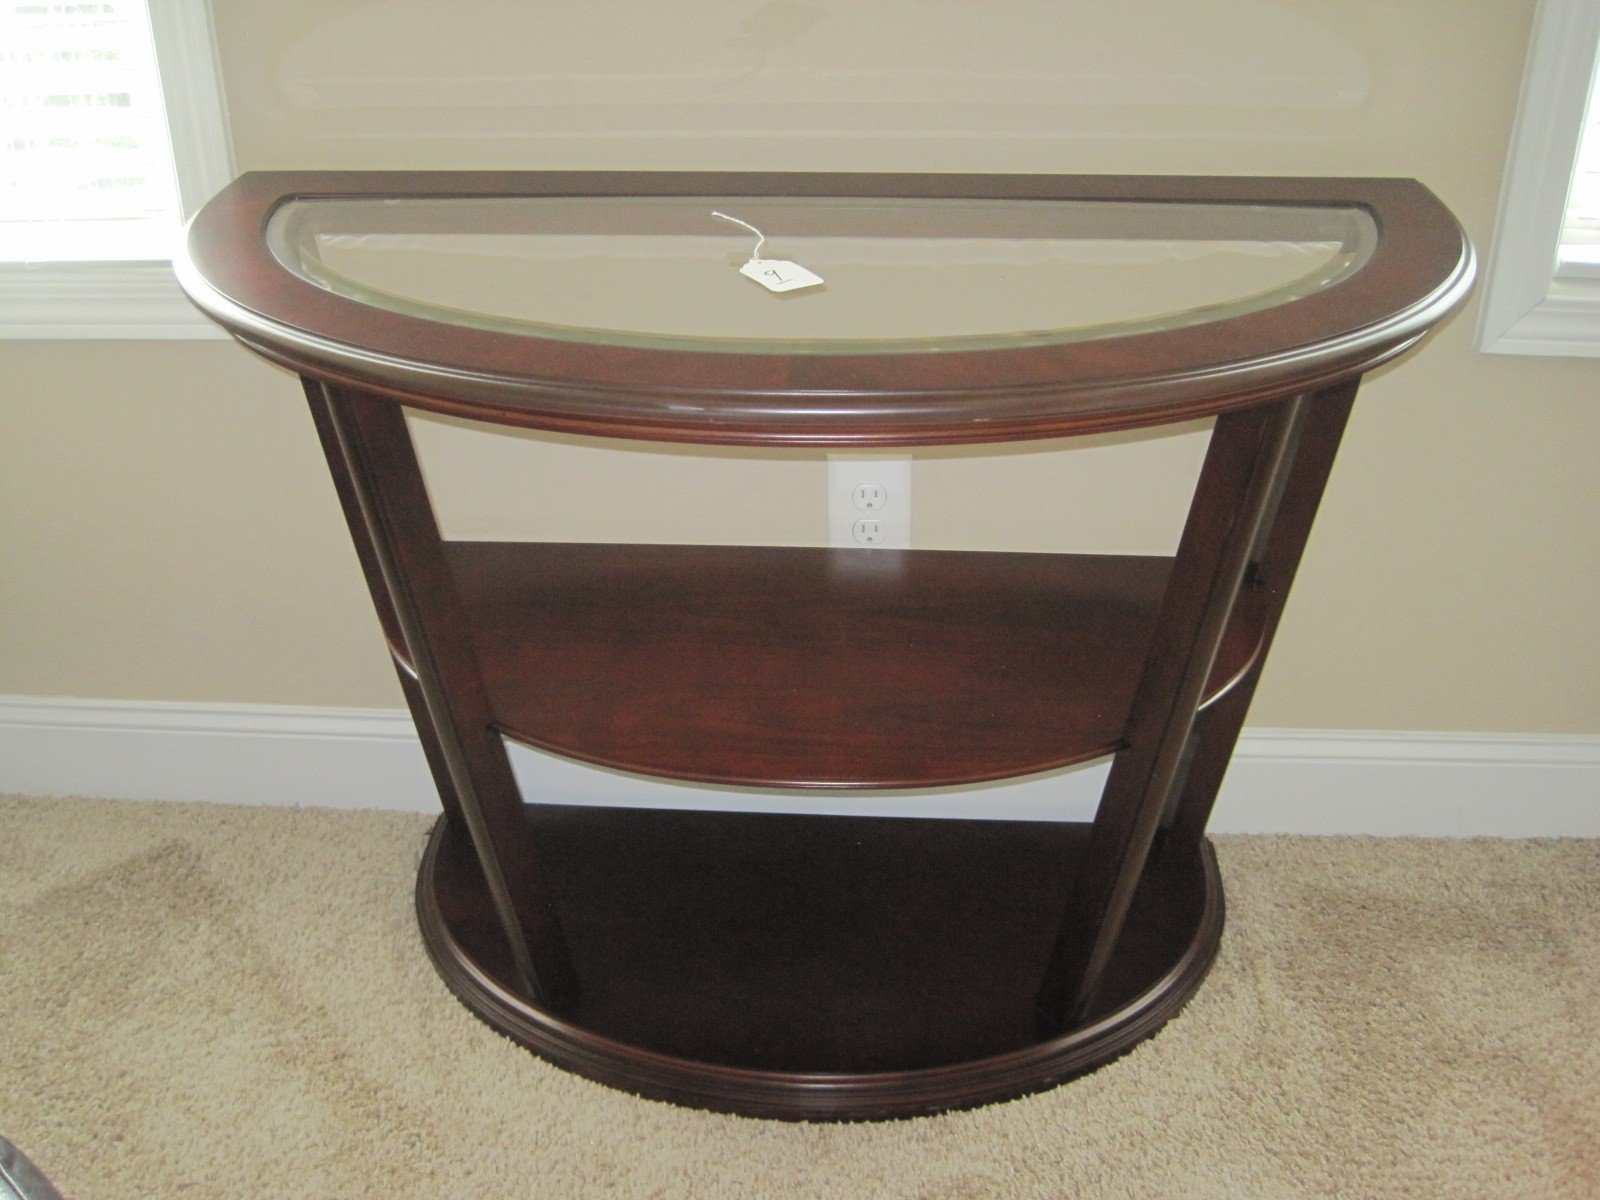 Super Bombay Co Cherry Finish Modern Contemporary Sofa Entry Lamtechconsult Wood Chair Design Ideas Lamtechconsultcom